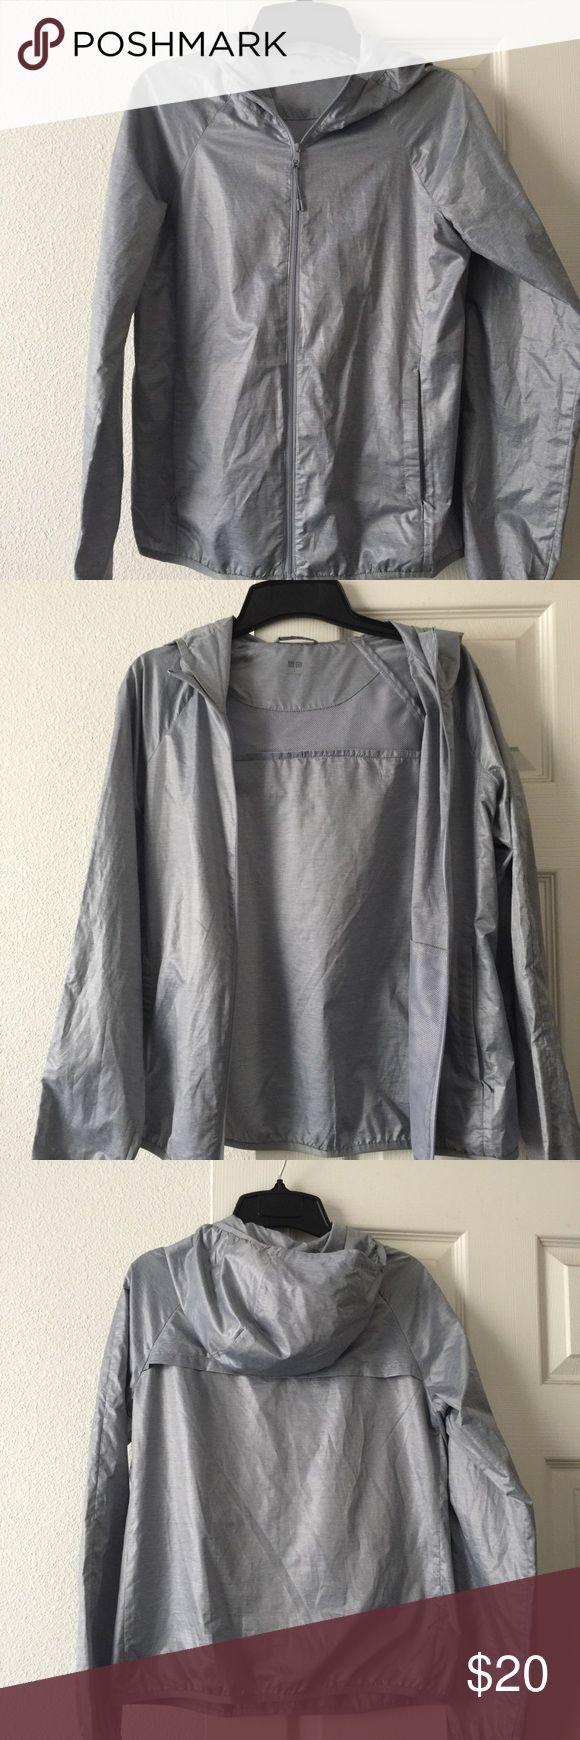 Uniqlo wind breaker jacket Wind breaker shell from Uniqlo. Silver/purple color. No flaws. Uniqlo Jackets & Coats